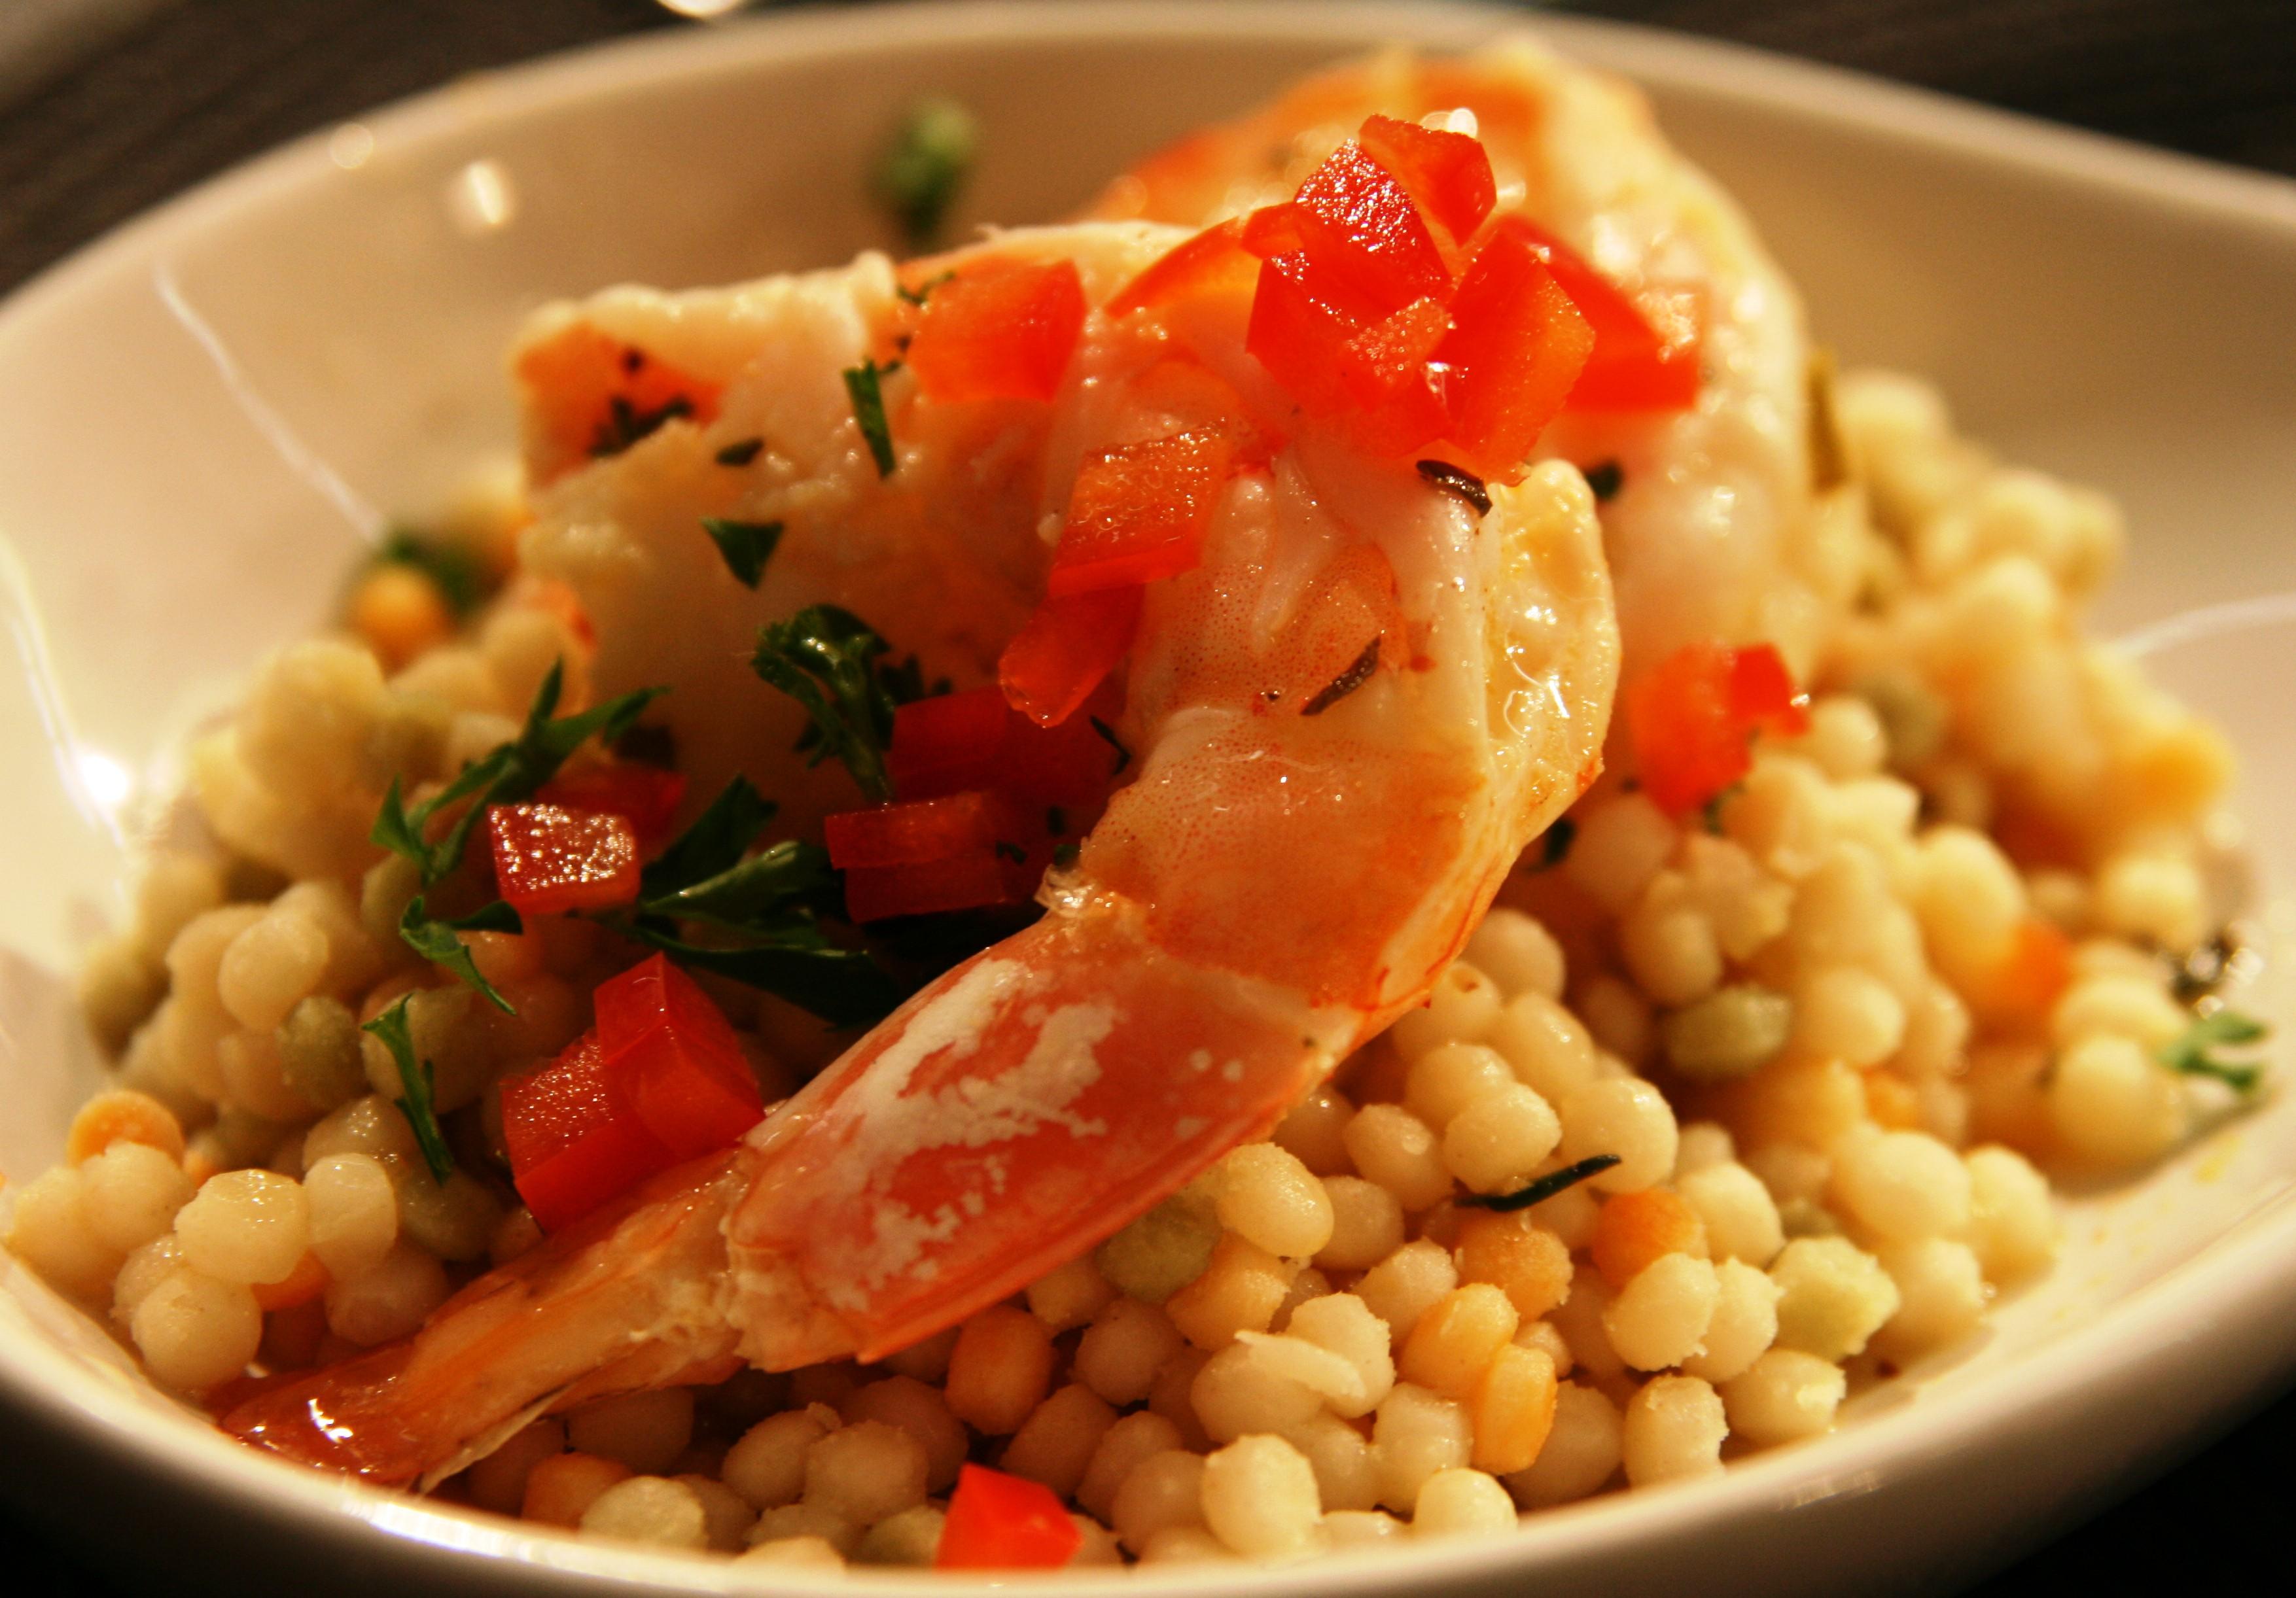 Chef Barb's Pittsburgh Shrimp: Spicy Citrus Poached Shrimp